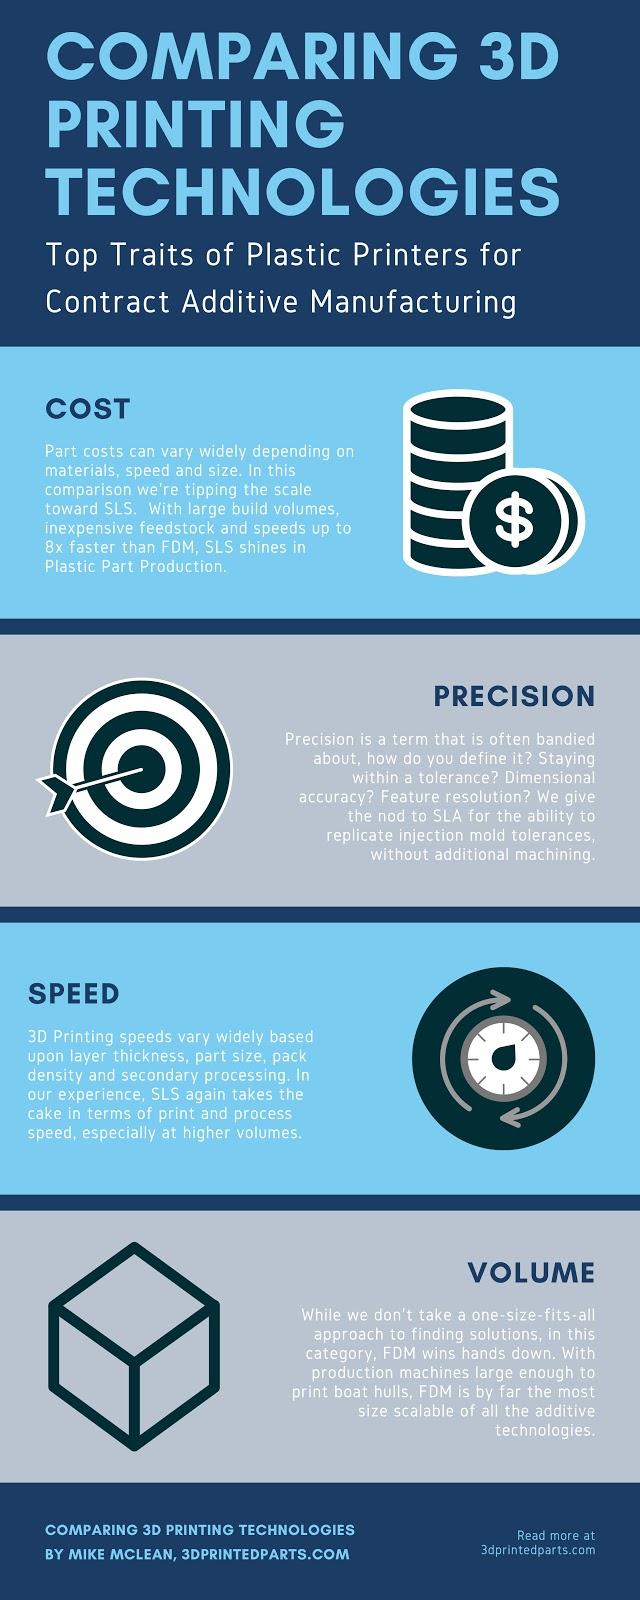 3d printing technologies comparison infographic